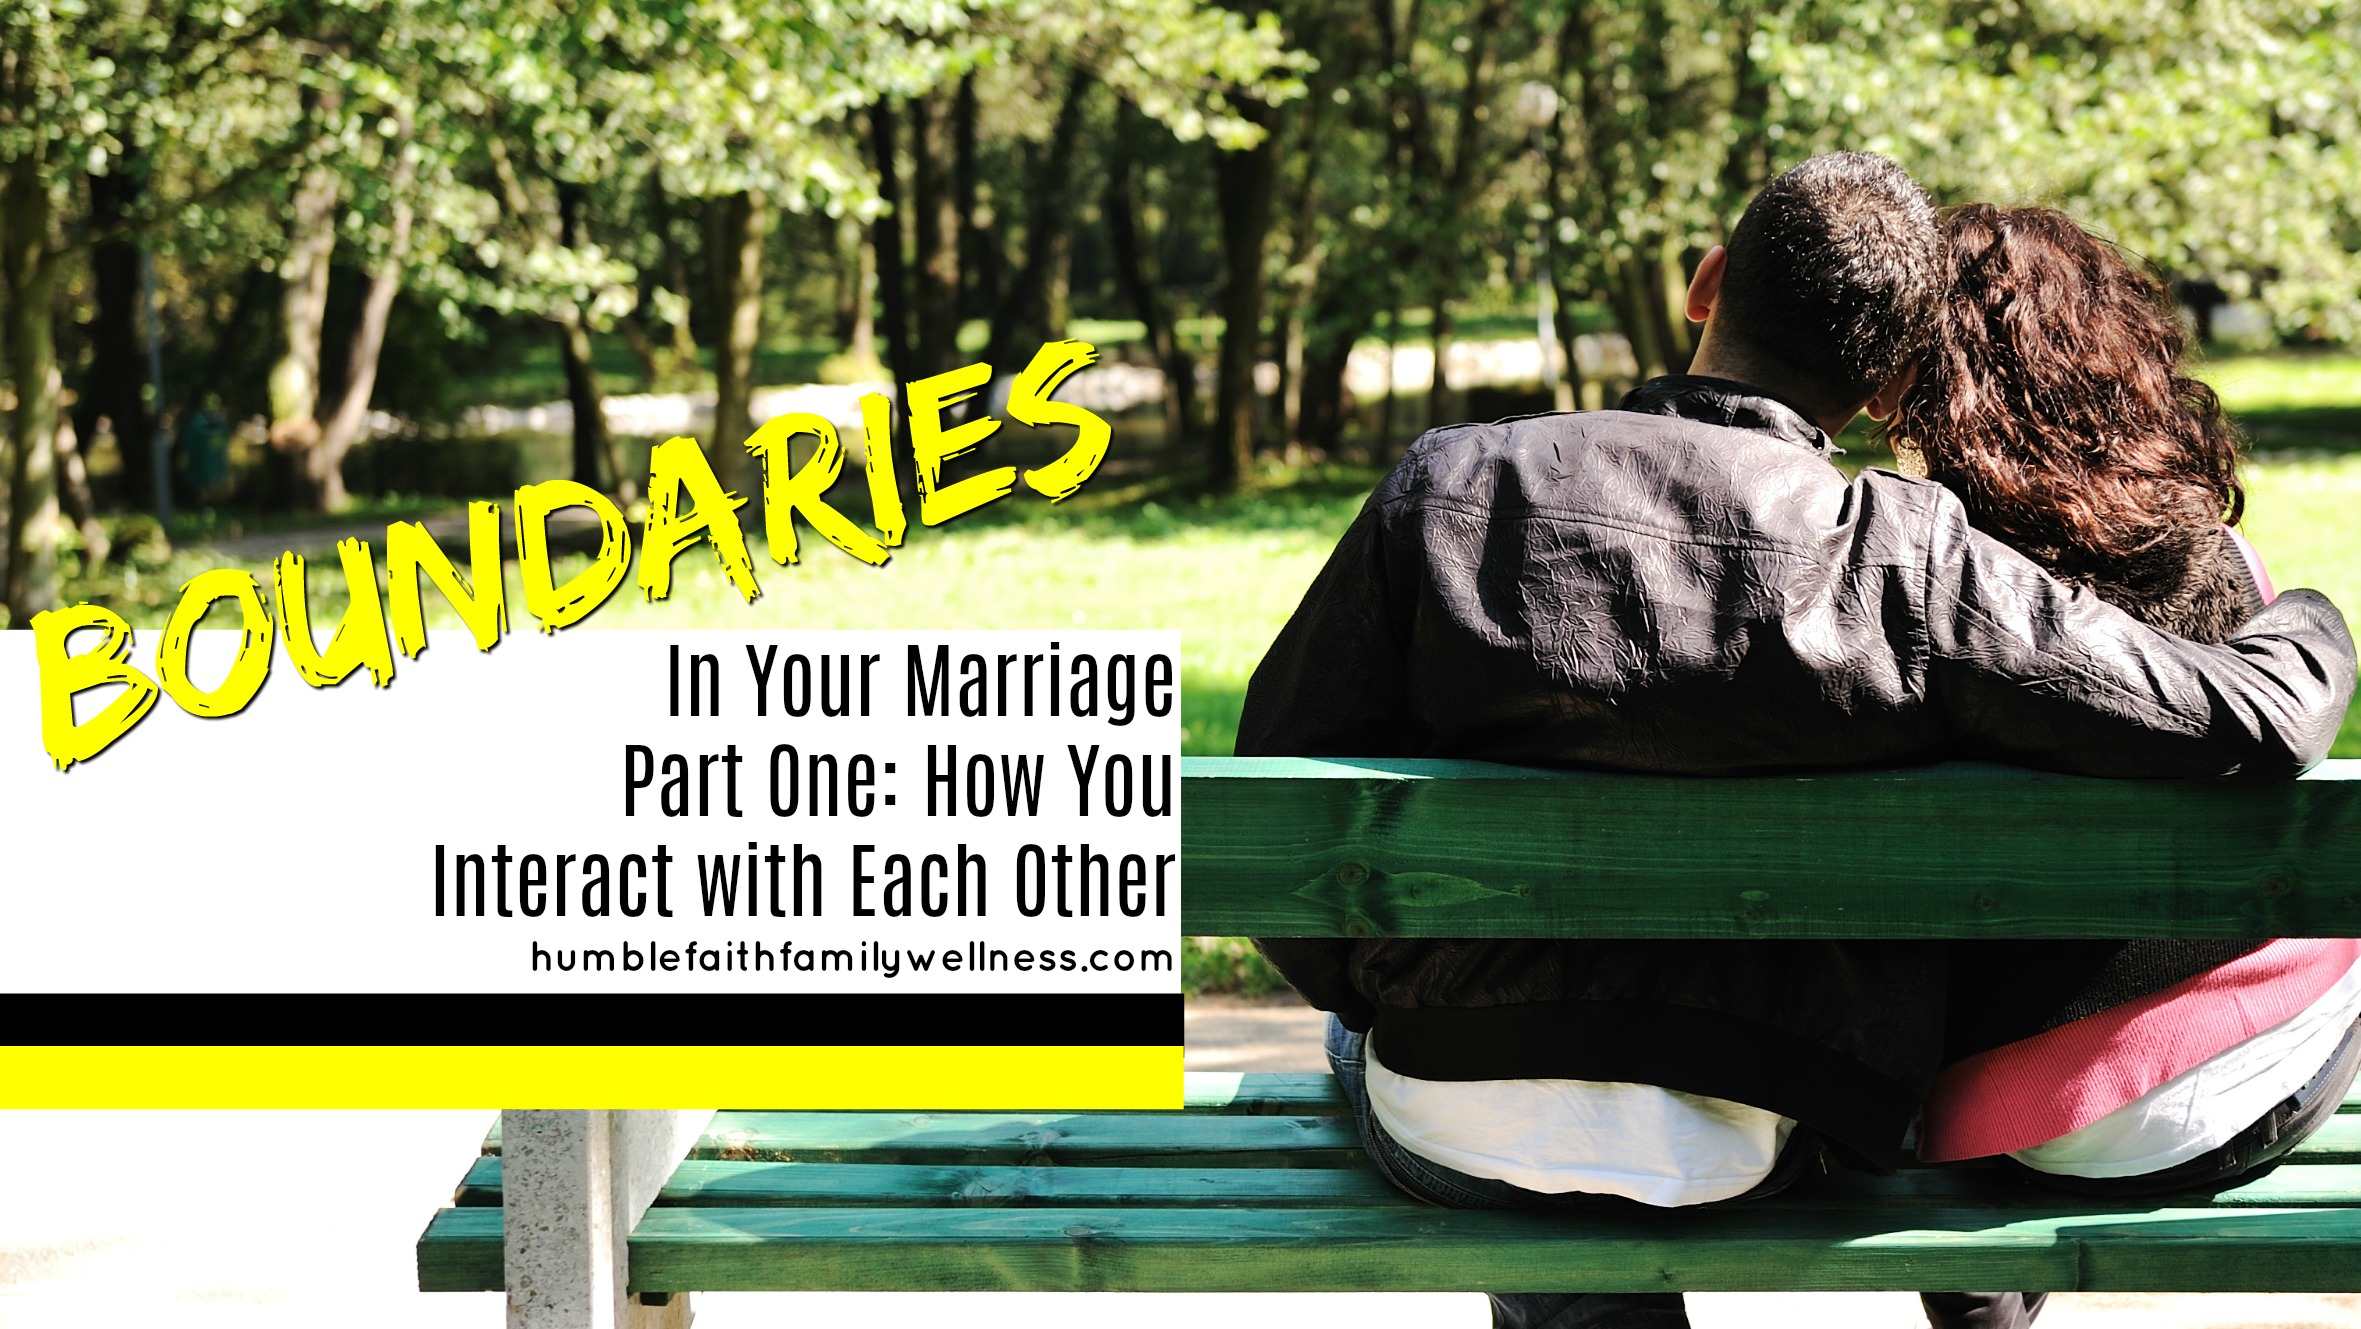 Interact, boundaries, marriage, faith